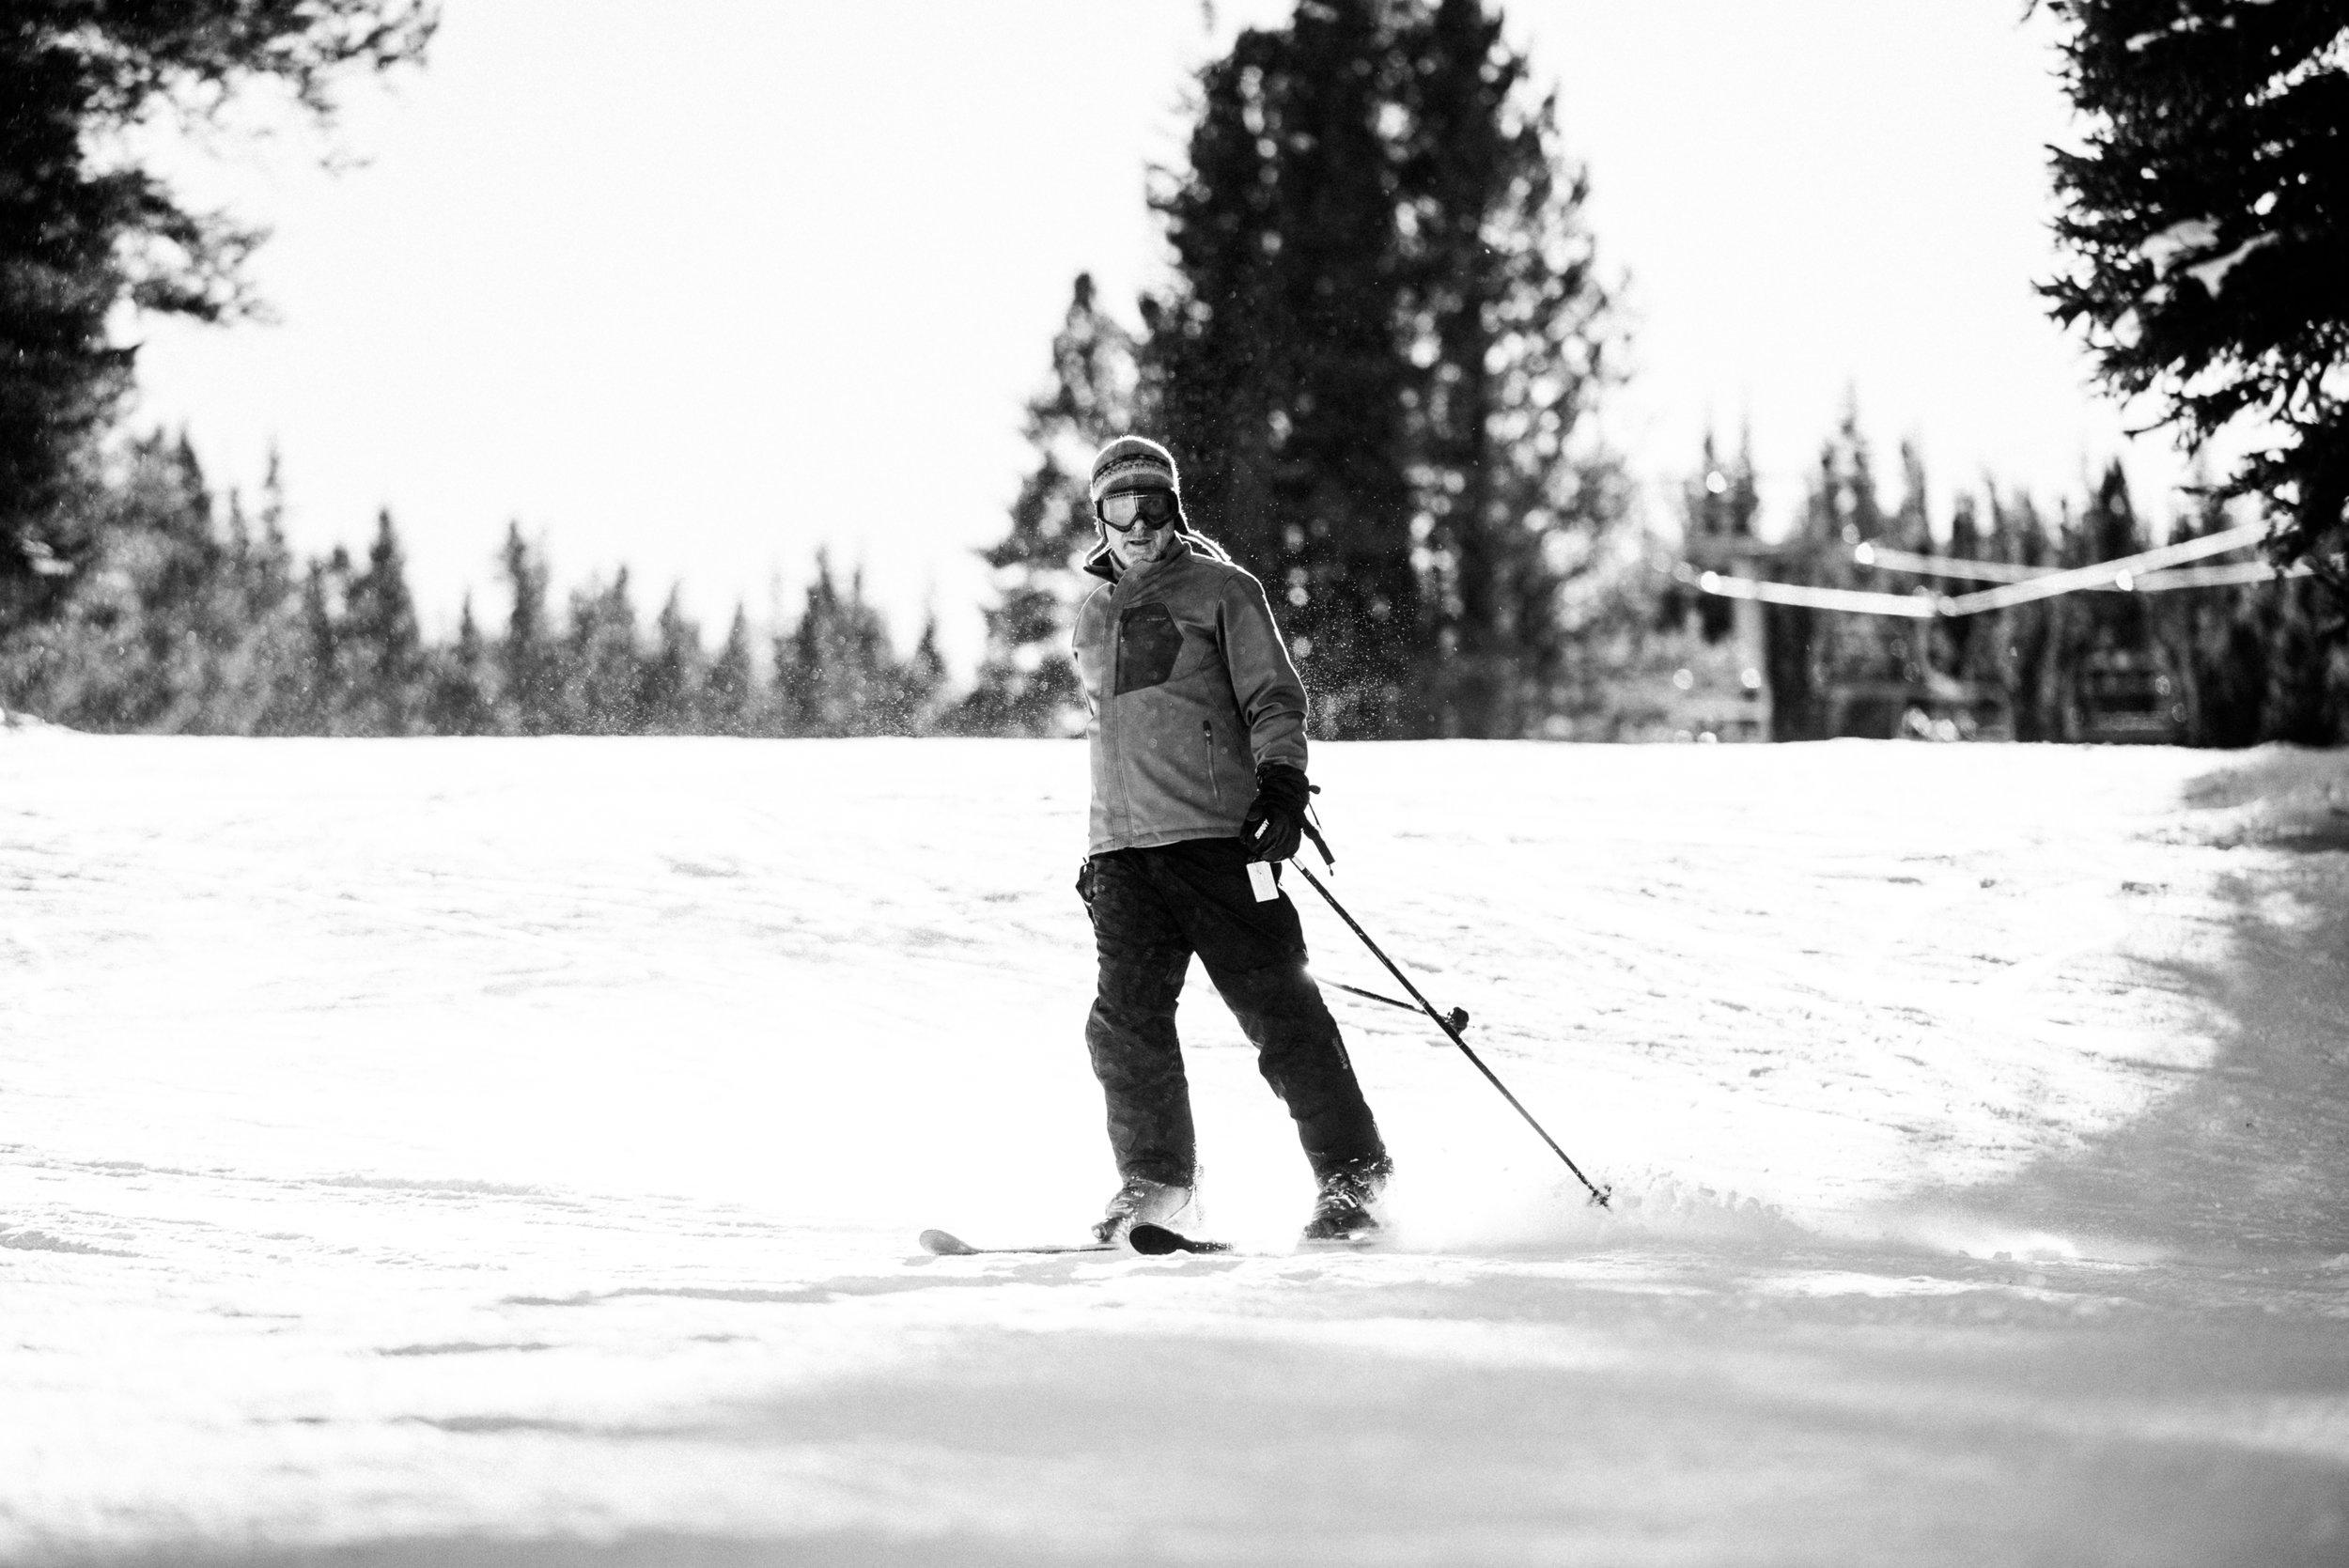 TaraShupe_Outdoor_Photographer_Loweprobags_Colorado_Copper_Mountains_Ski_49.jpg